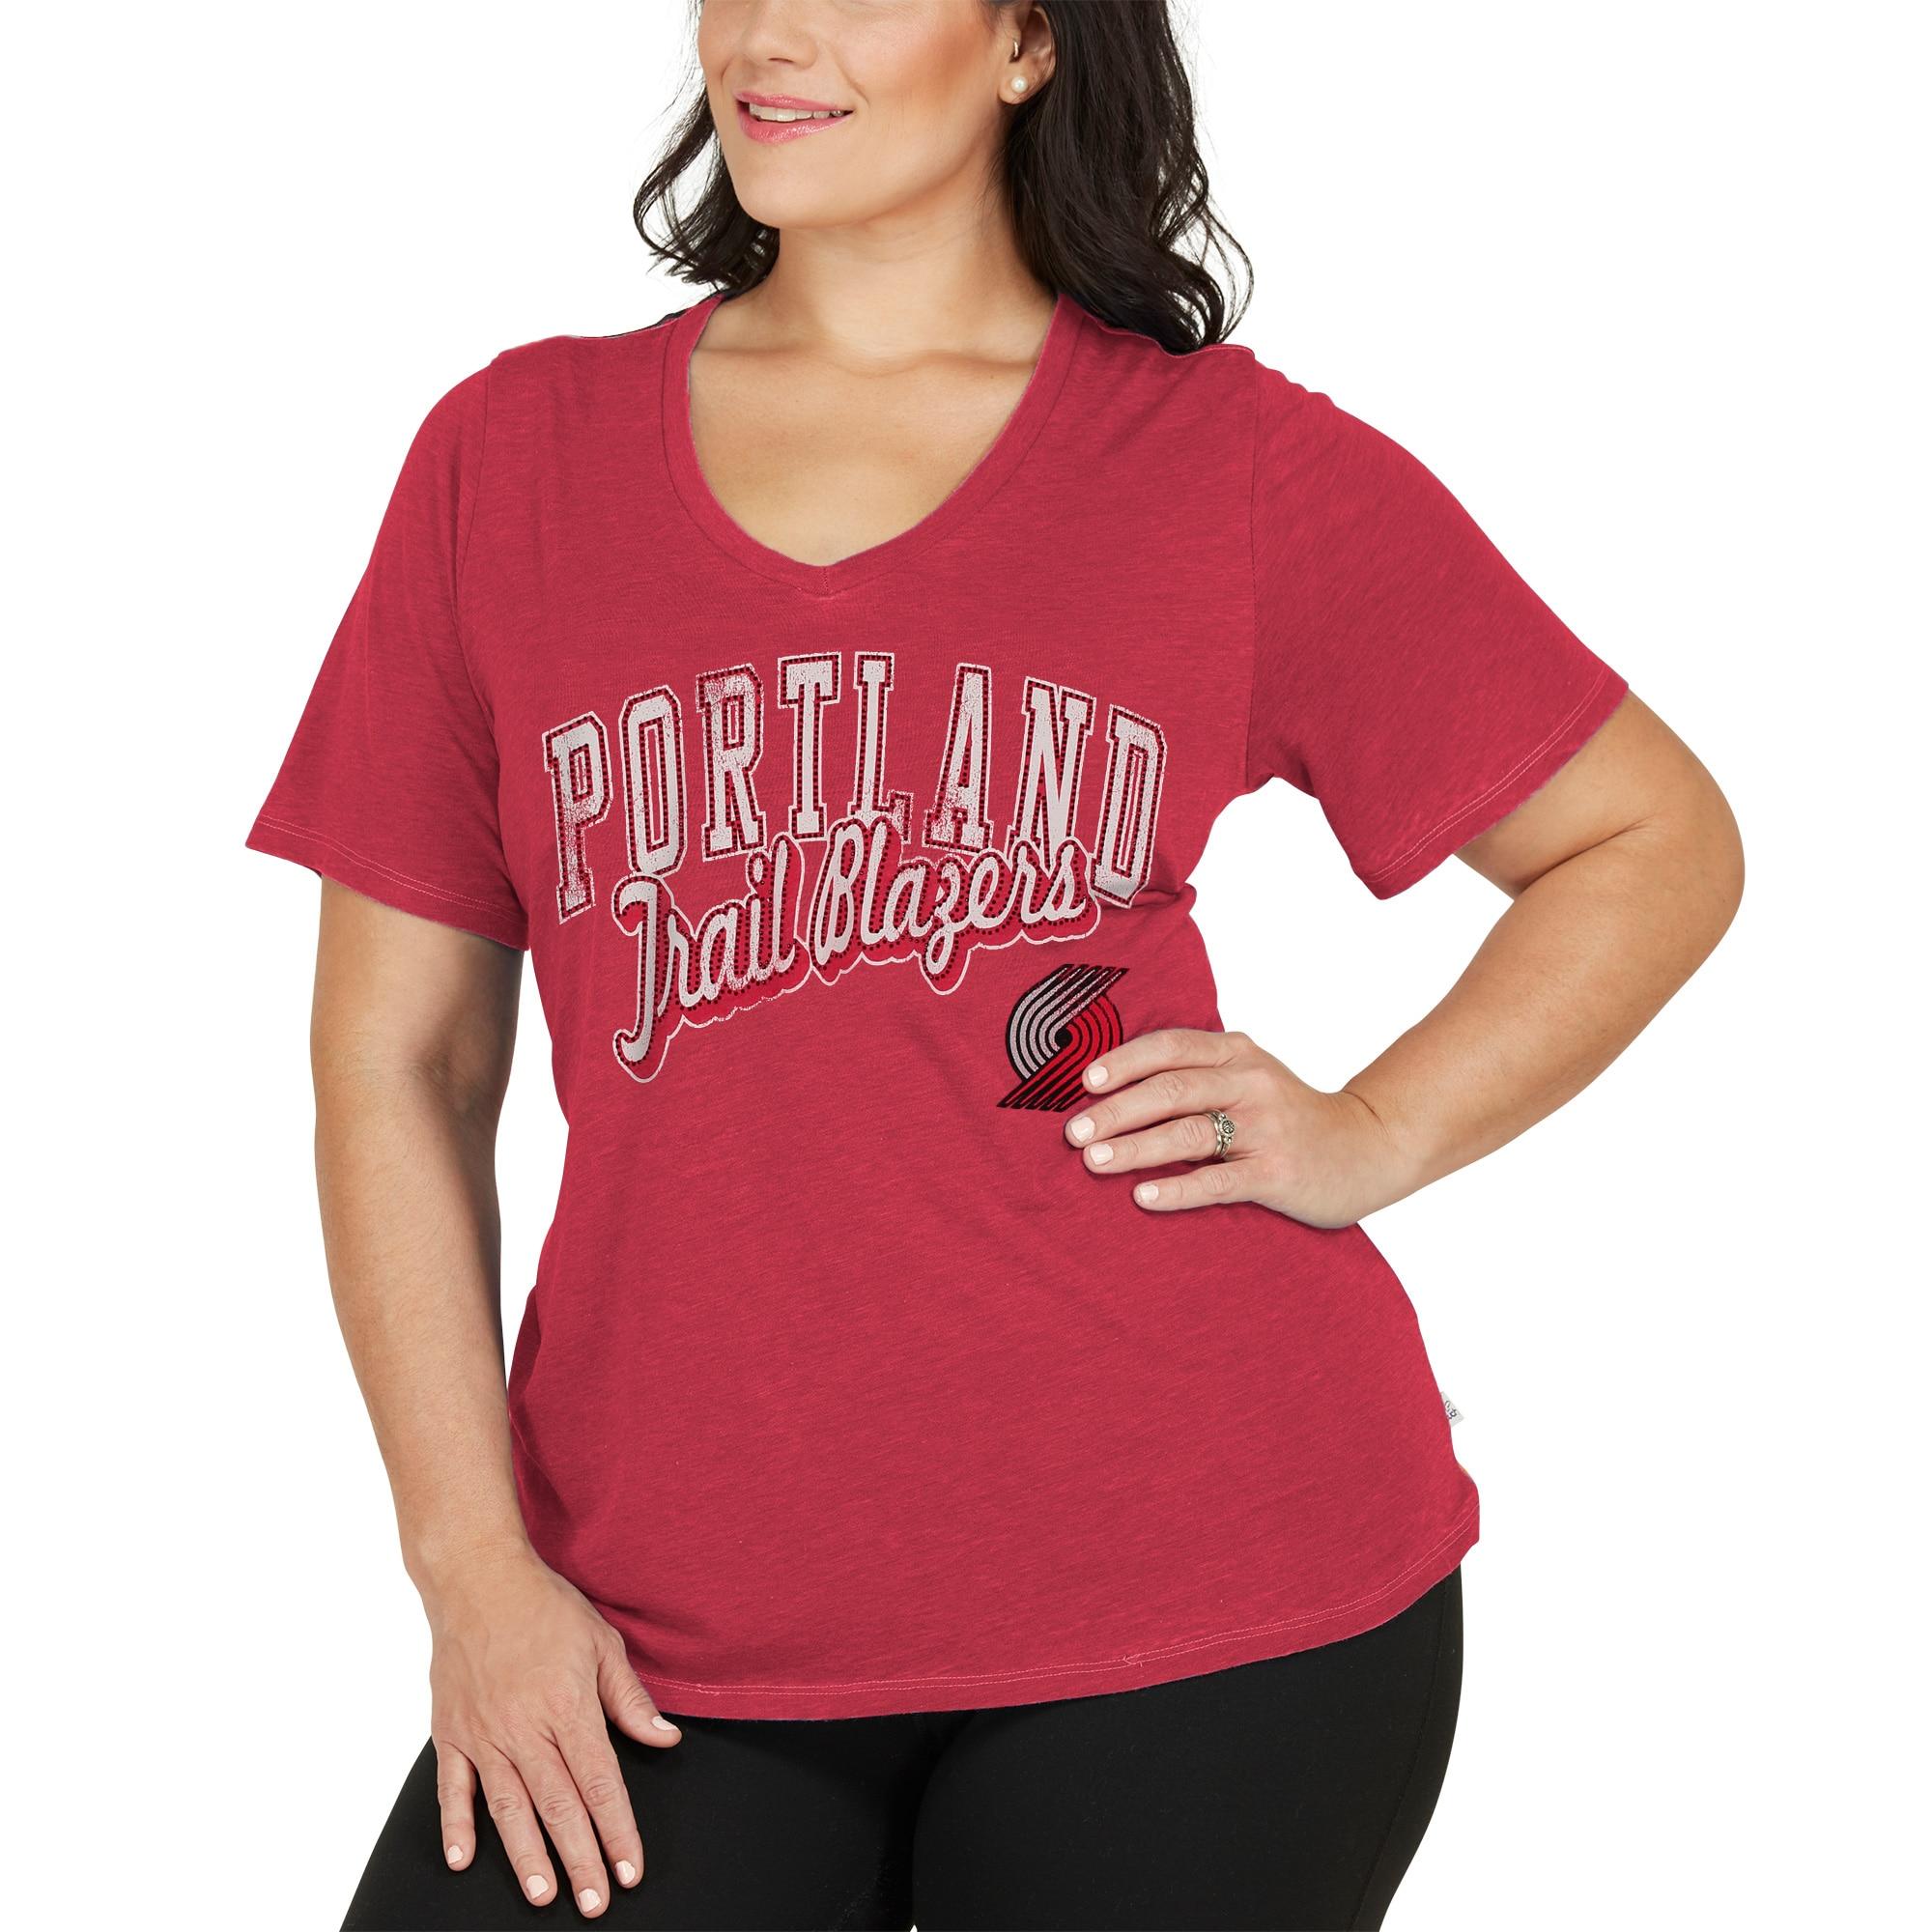 Portland Trail Blazers Touch by Alyssa Milano Women's Plus Size Star Player T-Shirt - Red